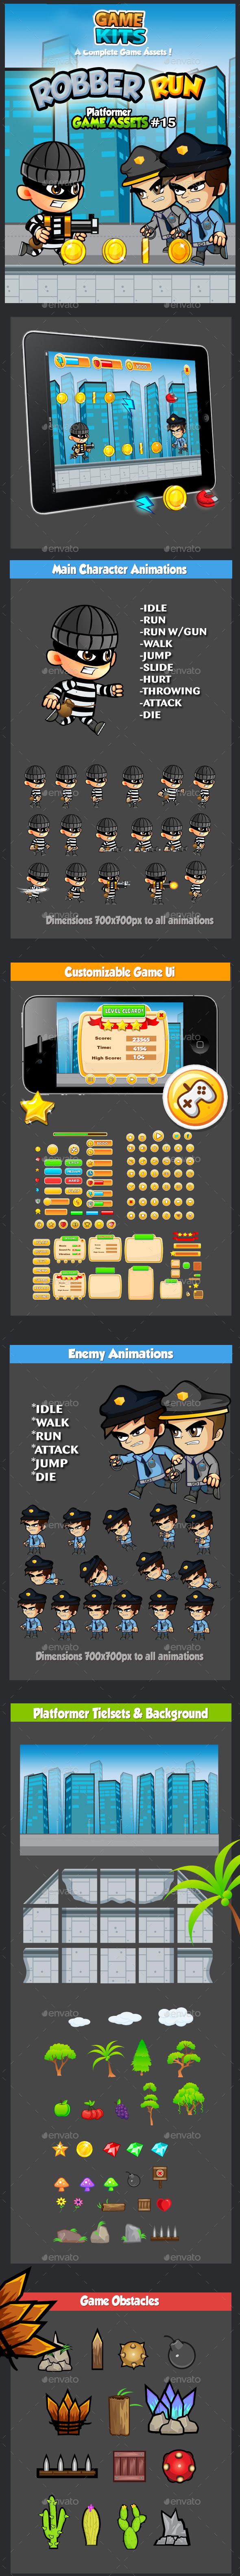 Robber Run Platformer Game Assets 15 - Game Kits Game Assets